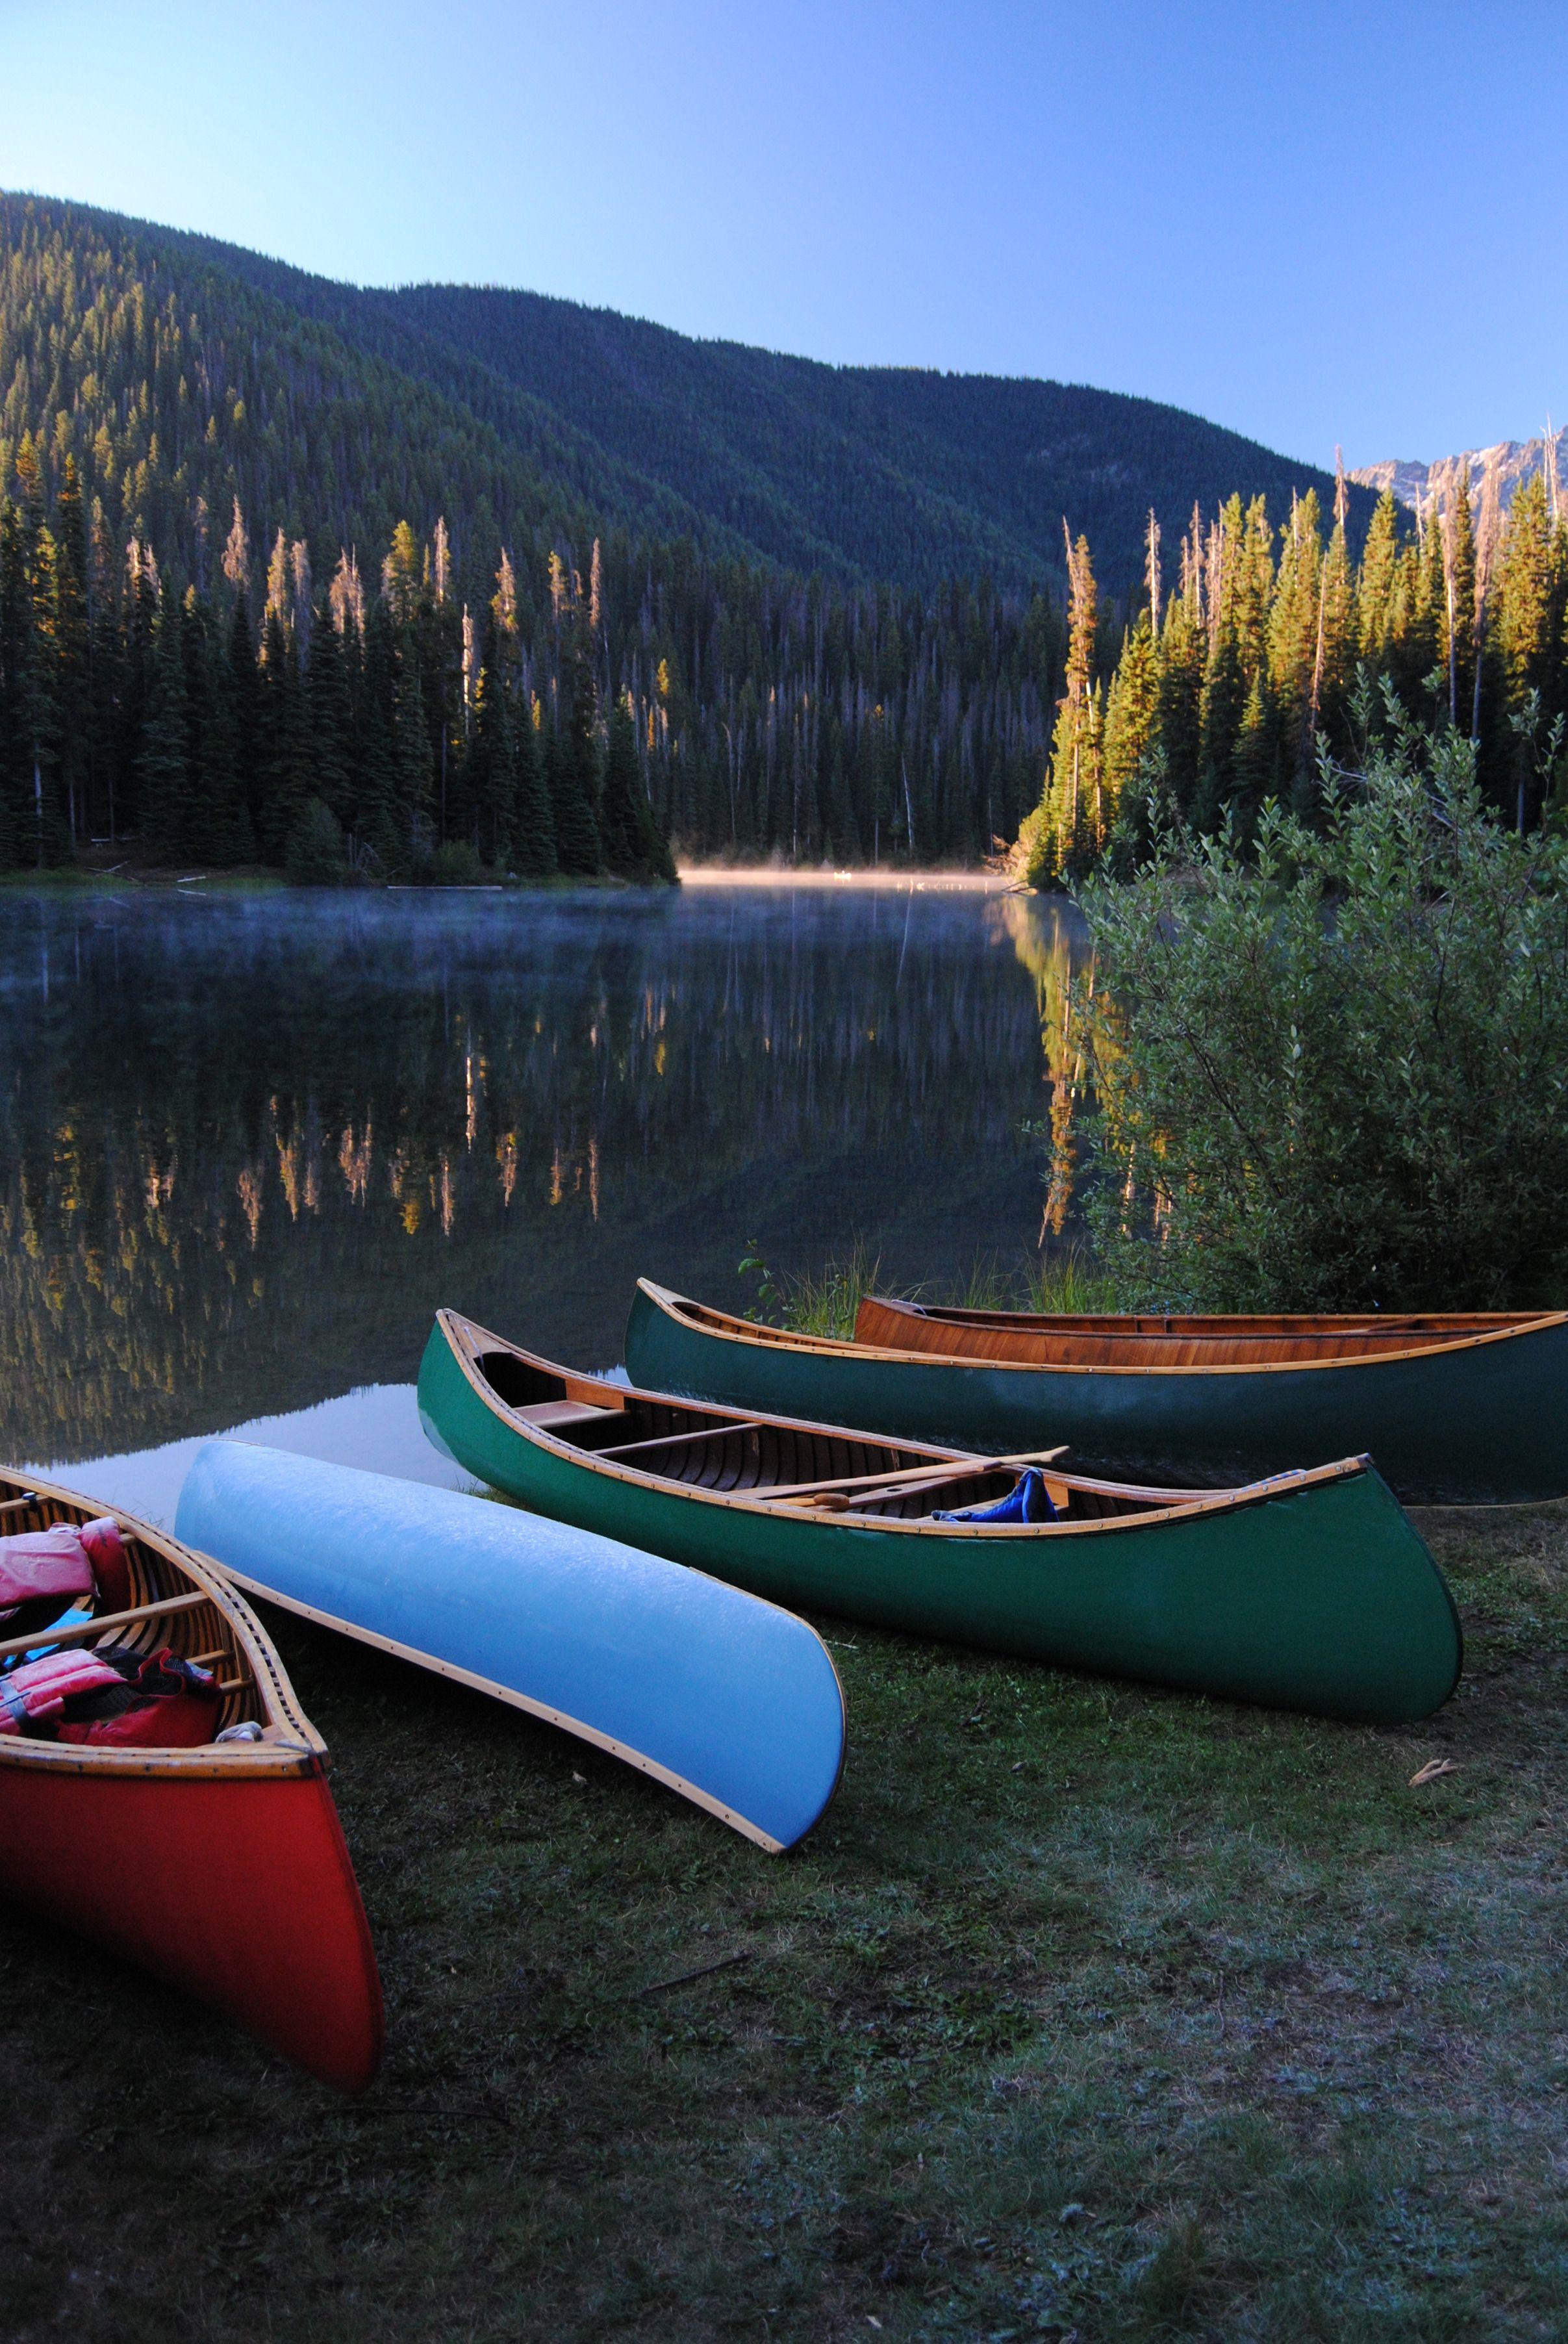 Northwest Chapter Of The Wooden Canoe Heritage Association Canoes On Lightning Lake In Manning Park